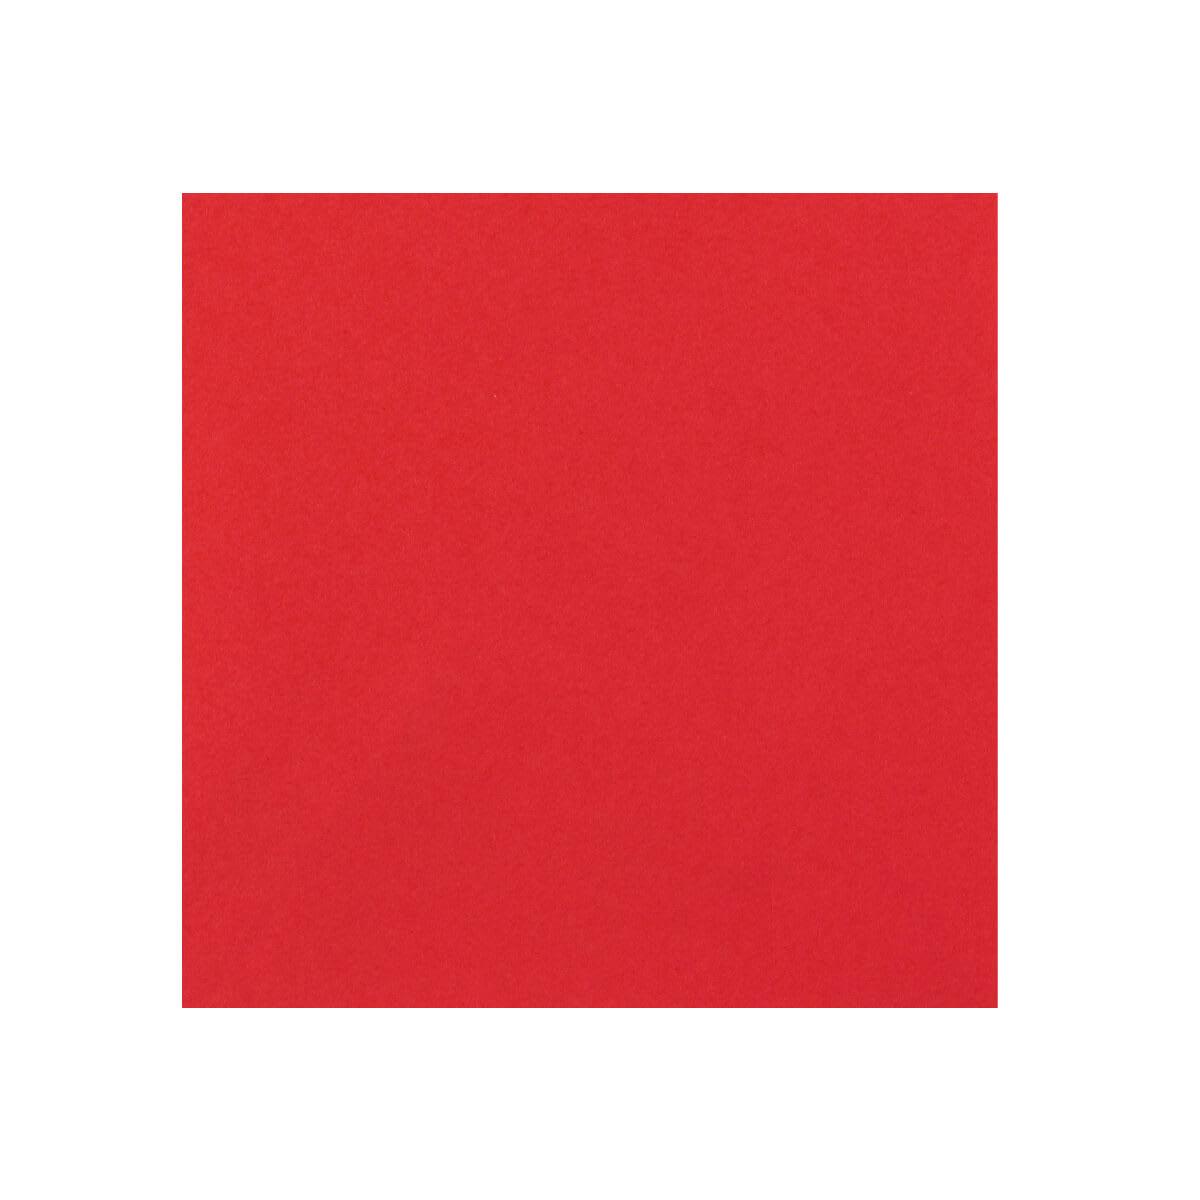 110 x 110mm BRIGHT RED ENVELOPES